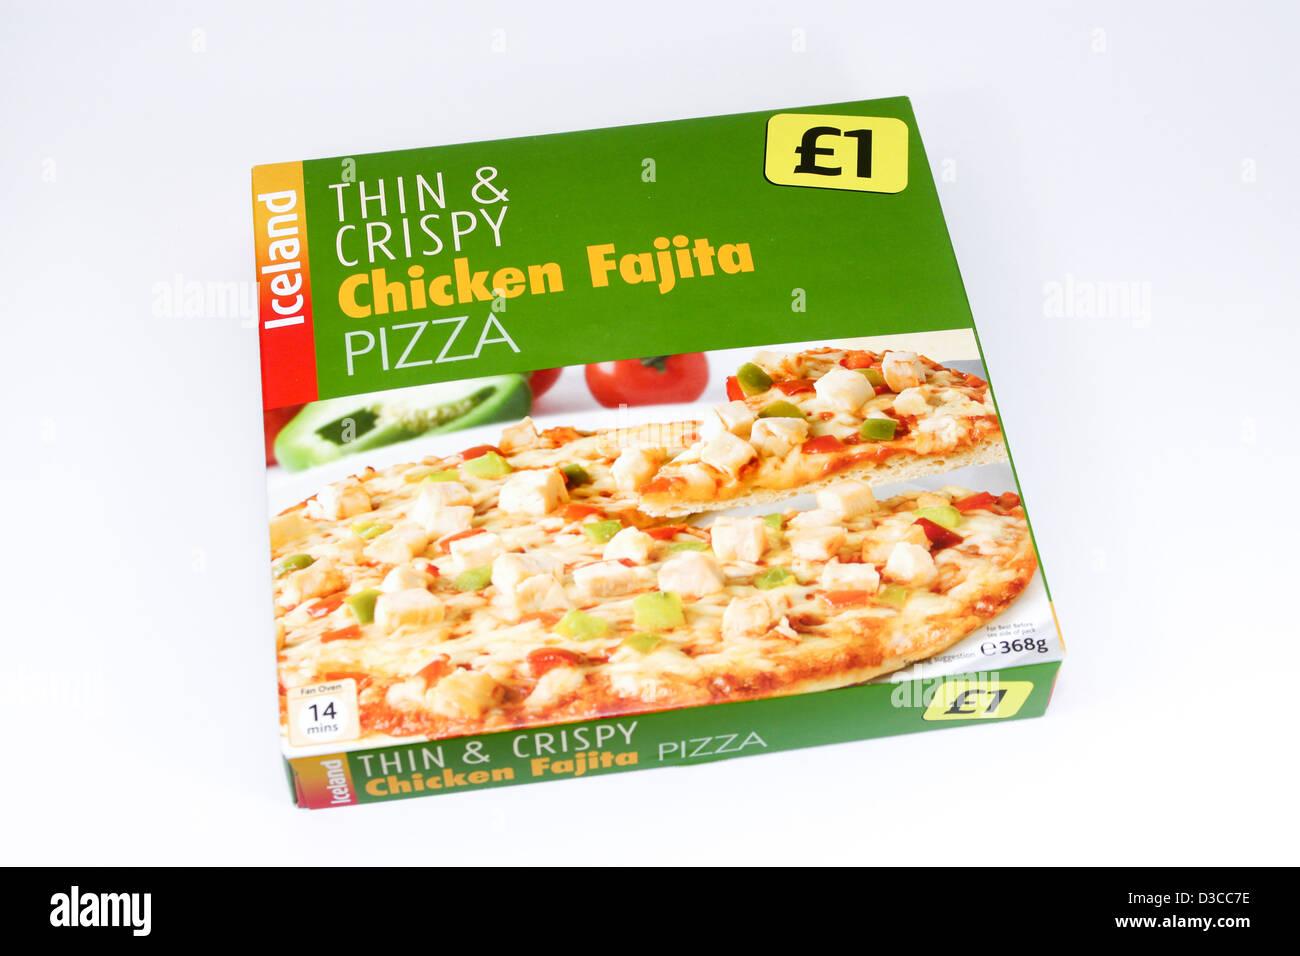 Iceland frozen foods chicken fajita pizza Stock Photo, Royalty Free ...